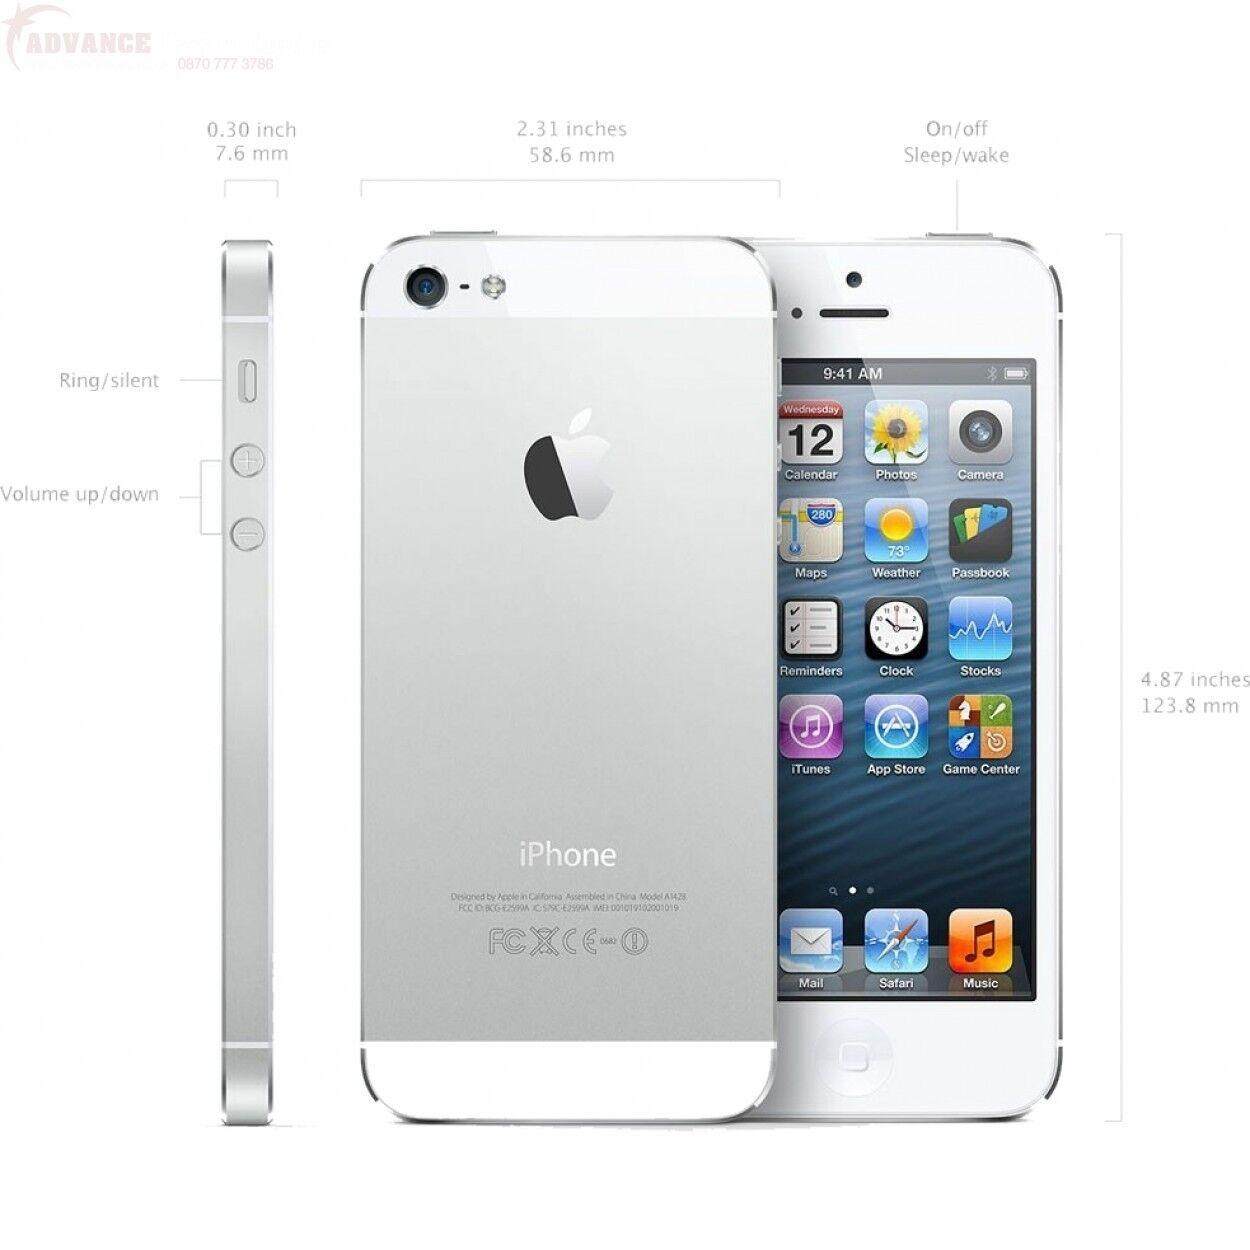 Ap apple iphone 5s space gray 32gb - Ap Apple Iphone 5s Space Gray 32gb 33